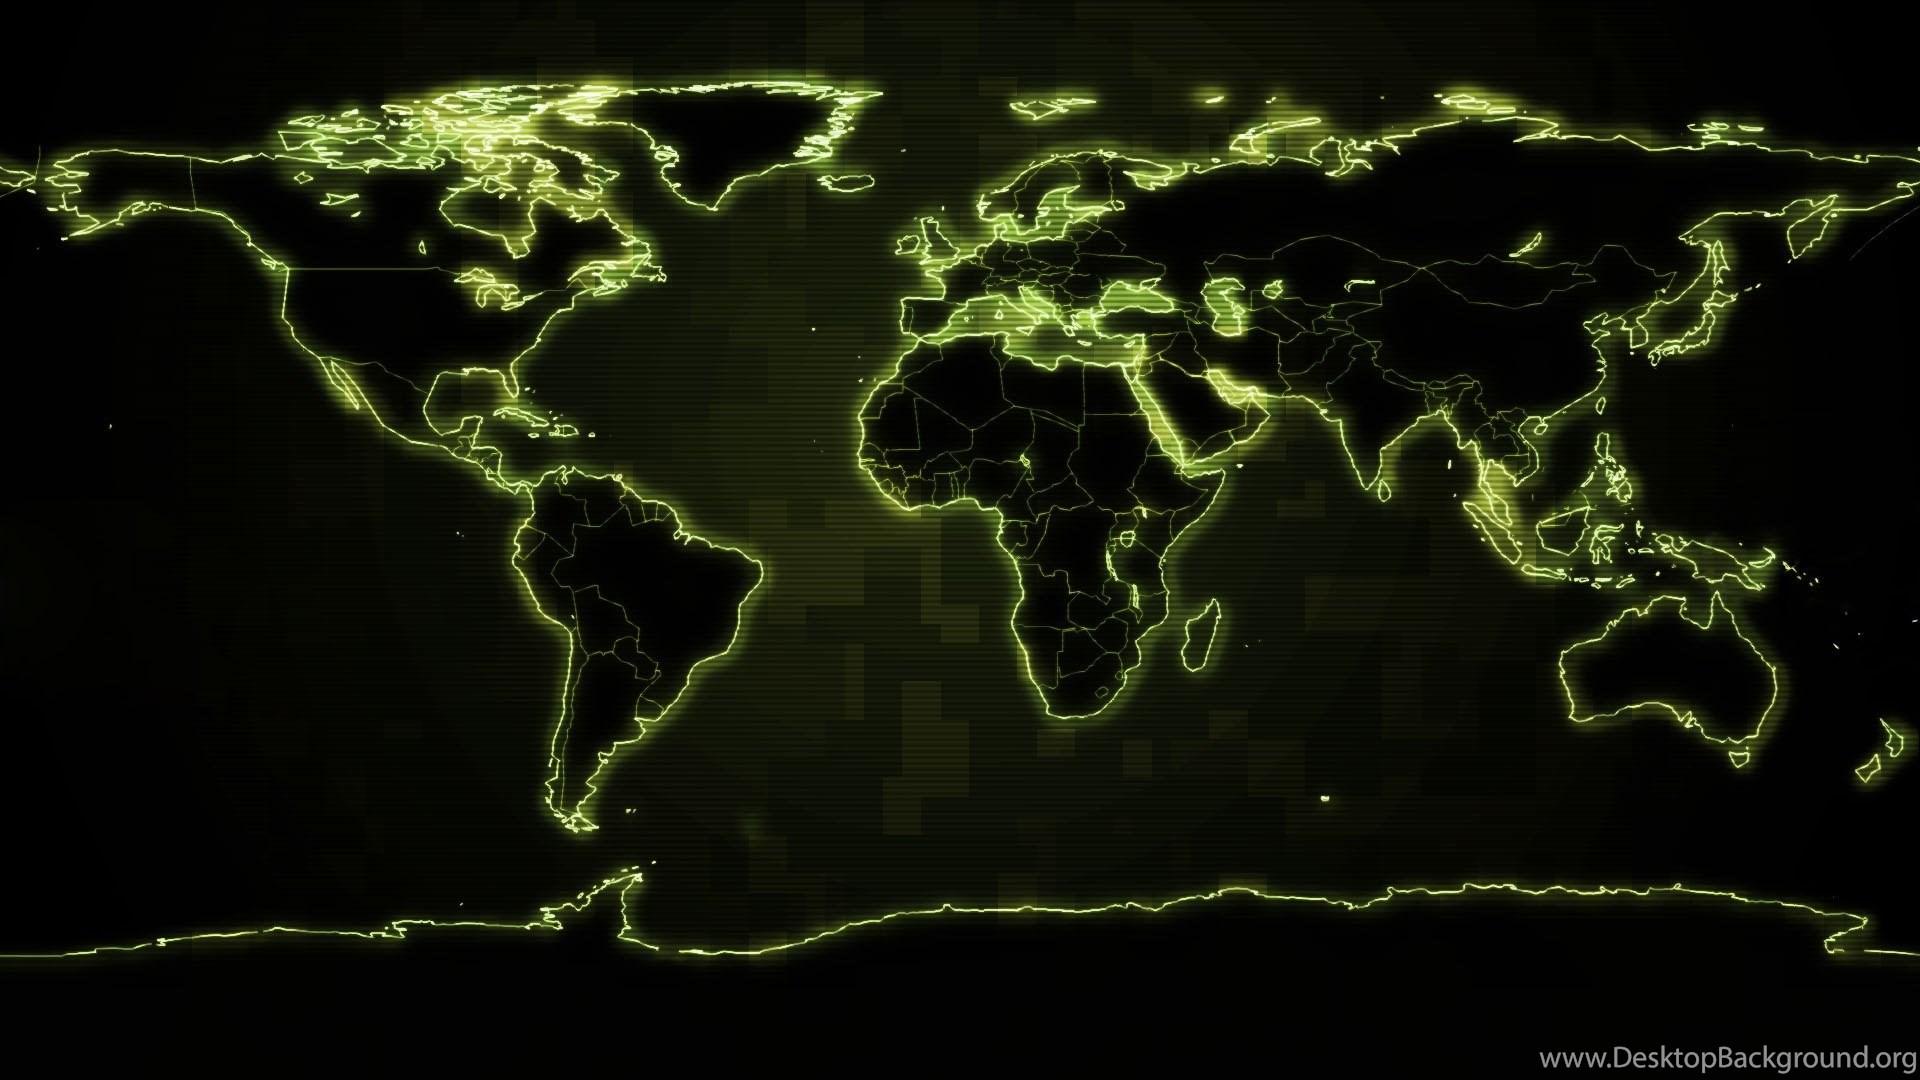 Digital world map wallpapers 1920x1080 desktop background popular gumiabroncs Images